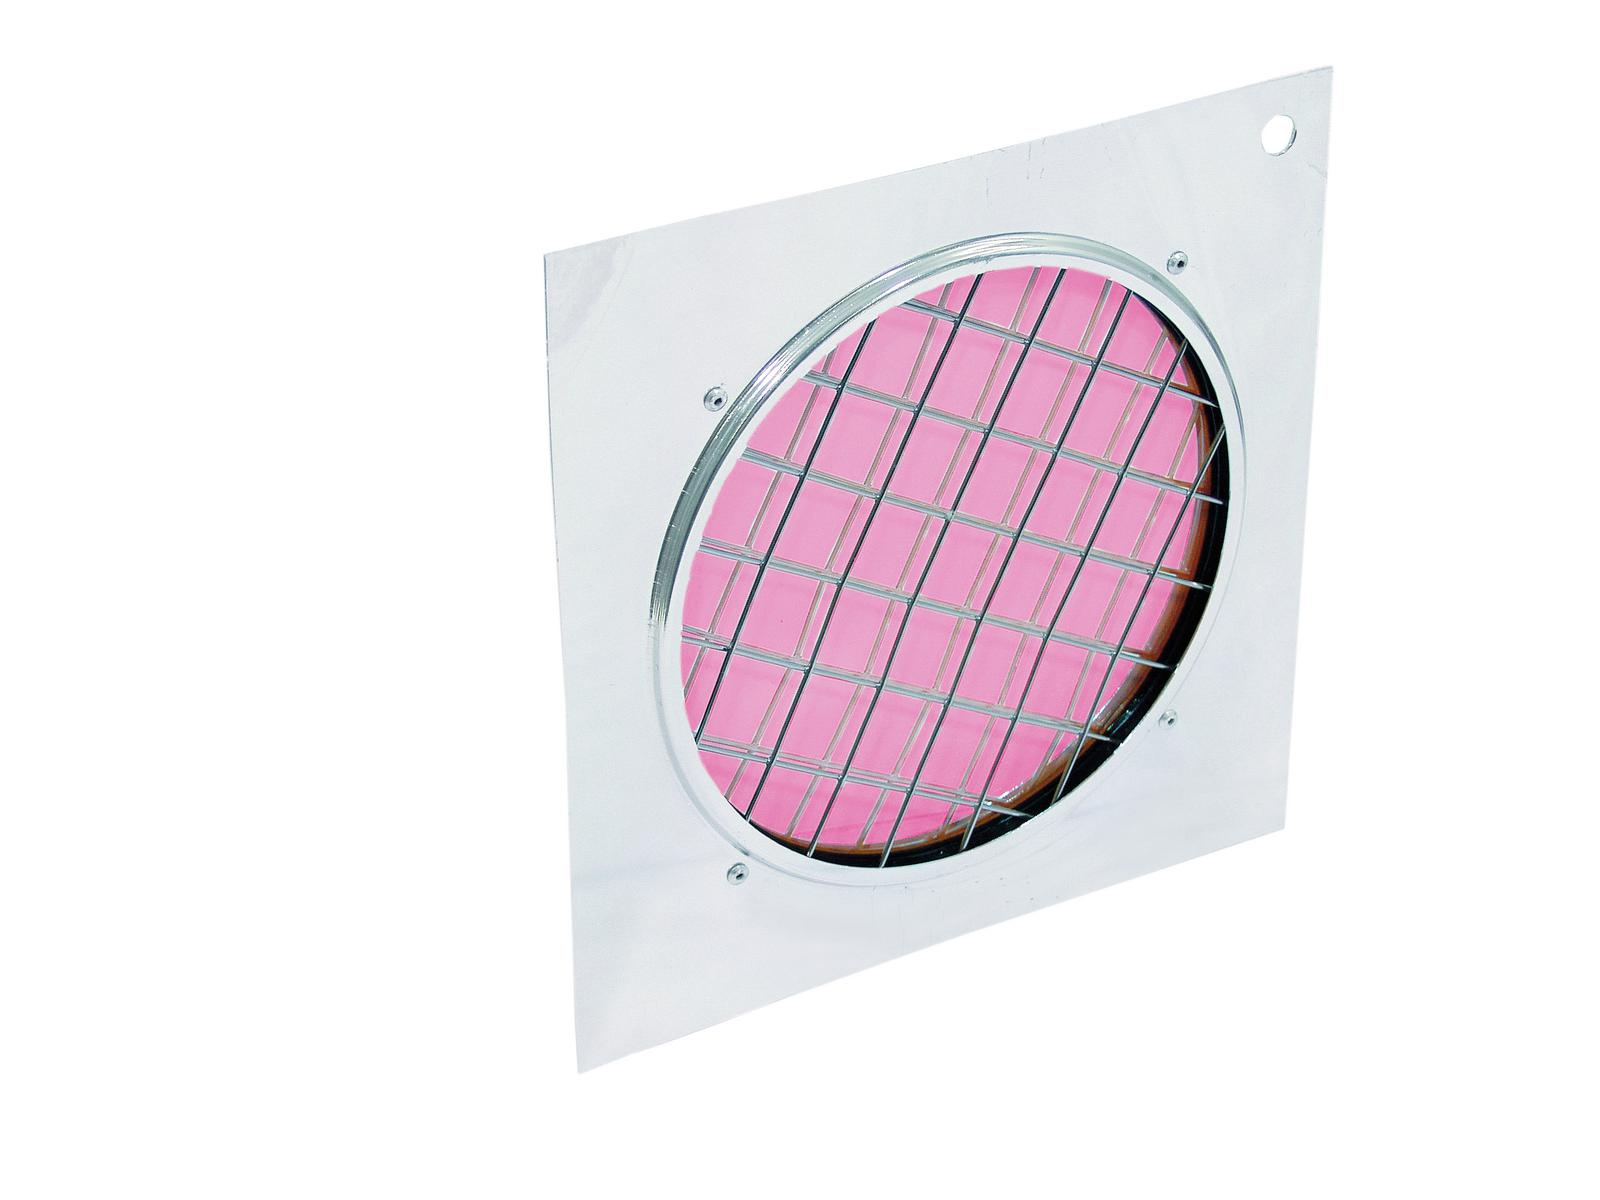 EUROLITE Dichro-Filter magenta, Rahmen sb PAR-56